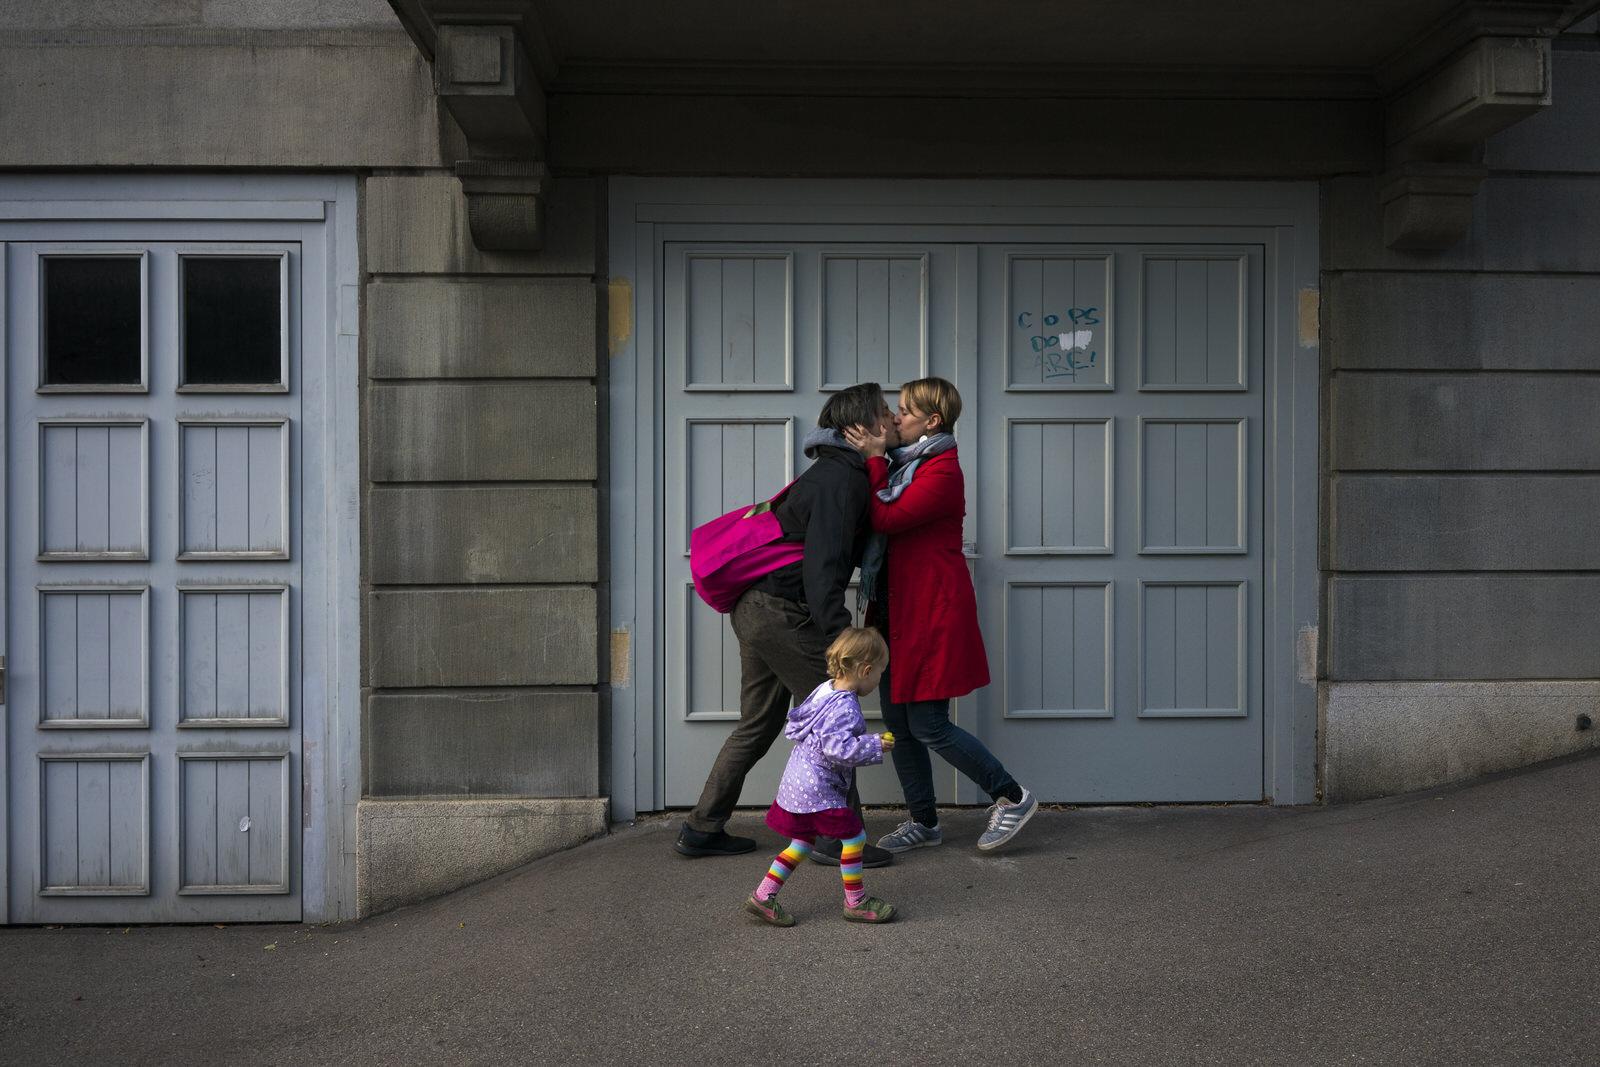 Familienfotografin Julia Erz zeigt Familienreportage